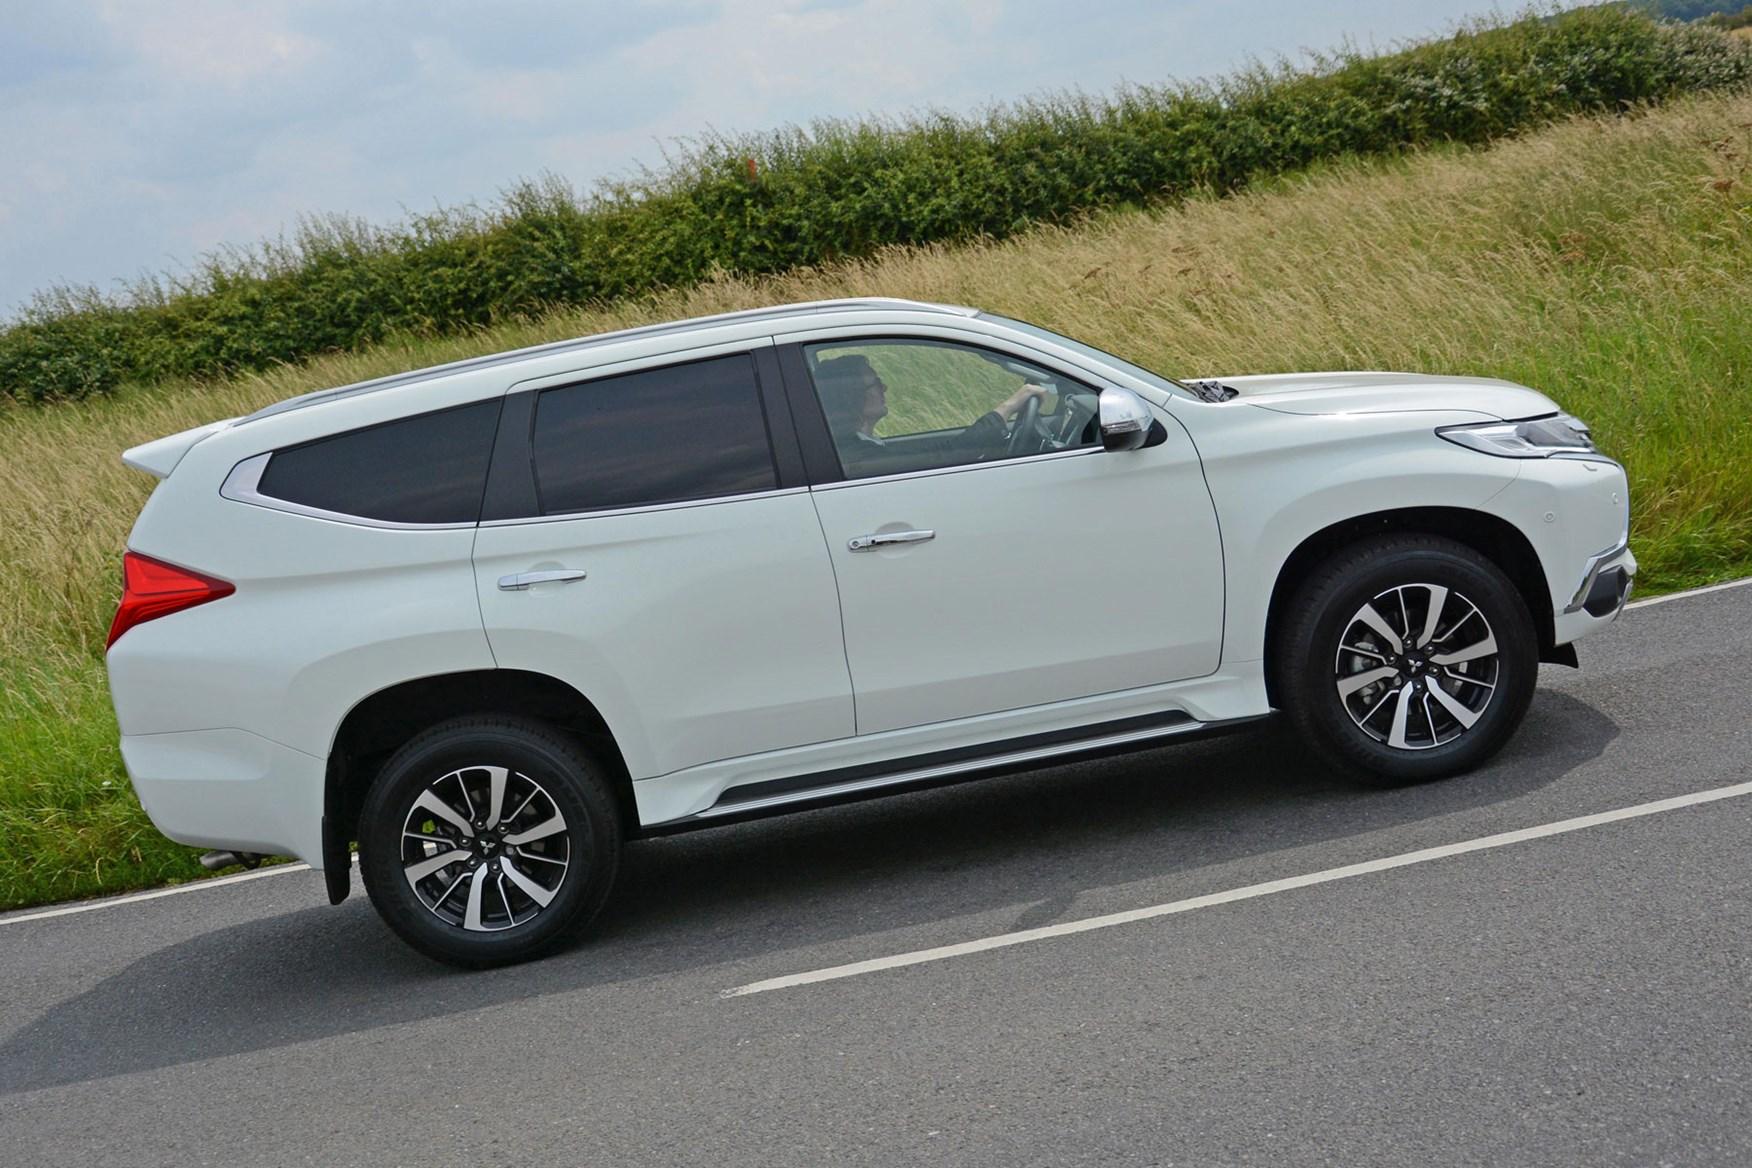 Mitsubishi Shogun Sport Commercial 4x4 van review - side view, white, driving